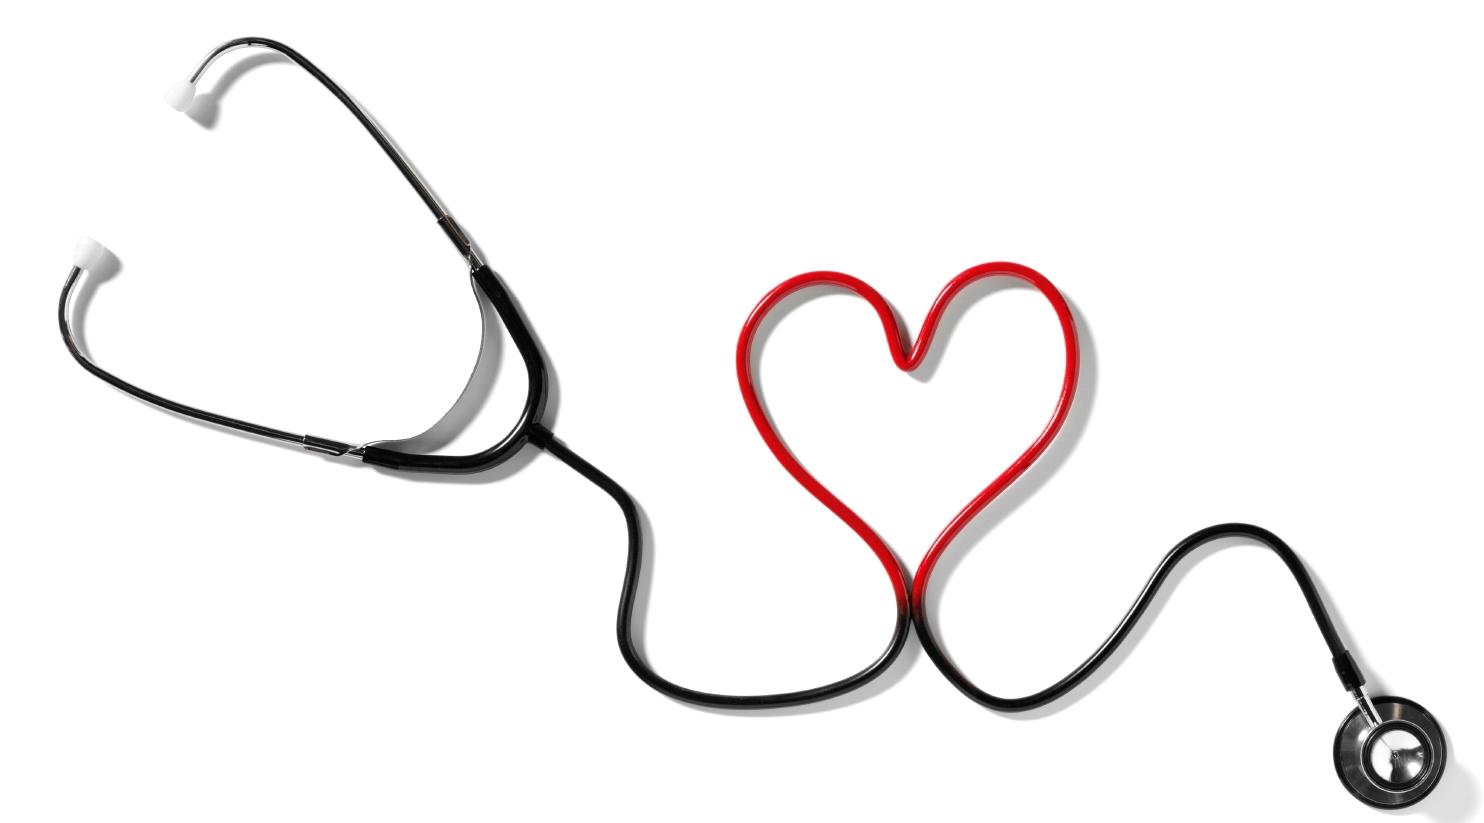 Hospice care clipart png transparent stock Stethoscope regular clip art medicalpletely free image ... png transparent stock